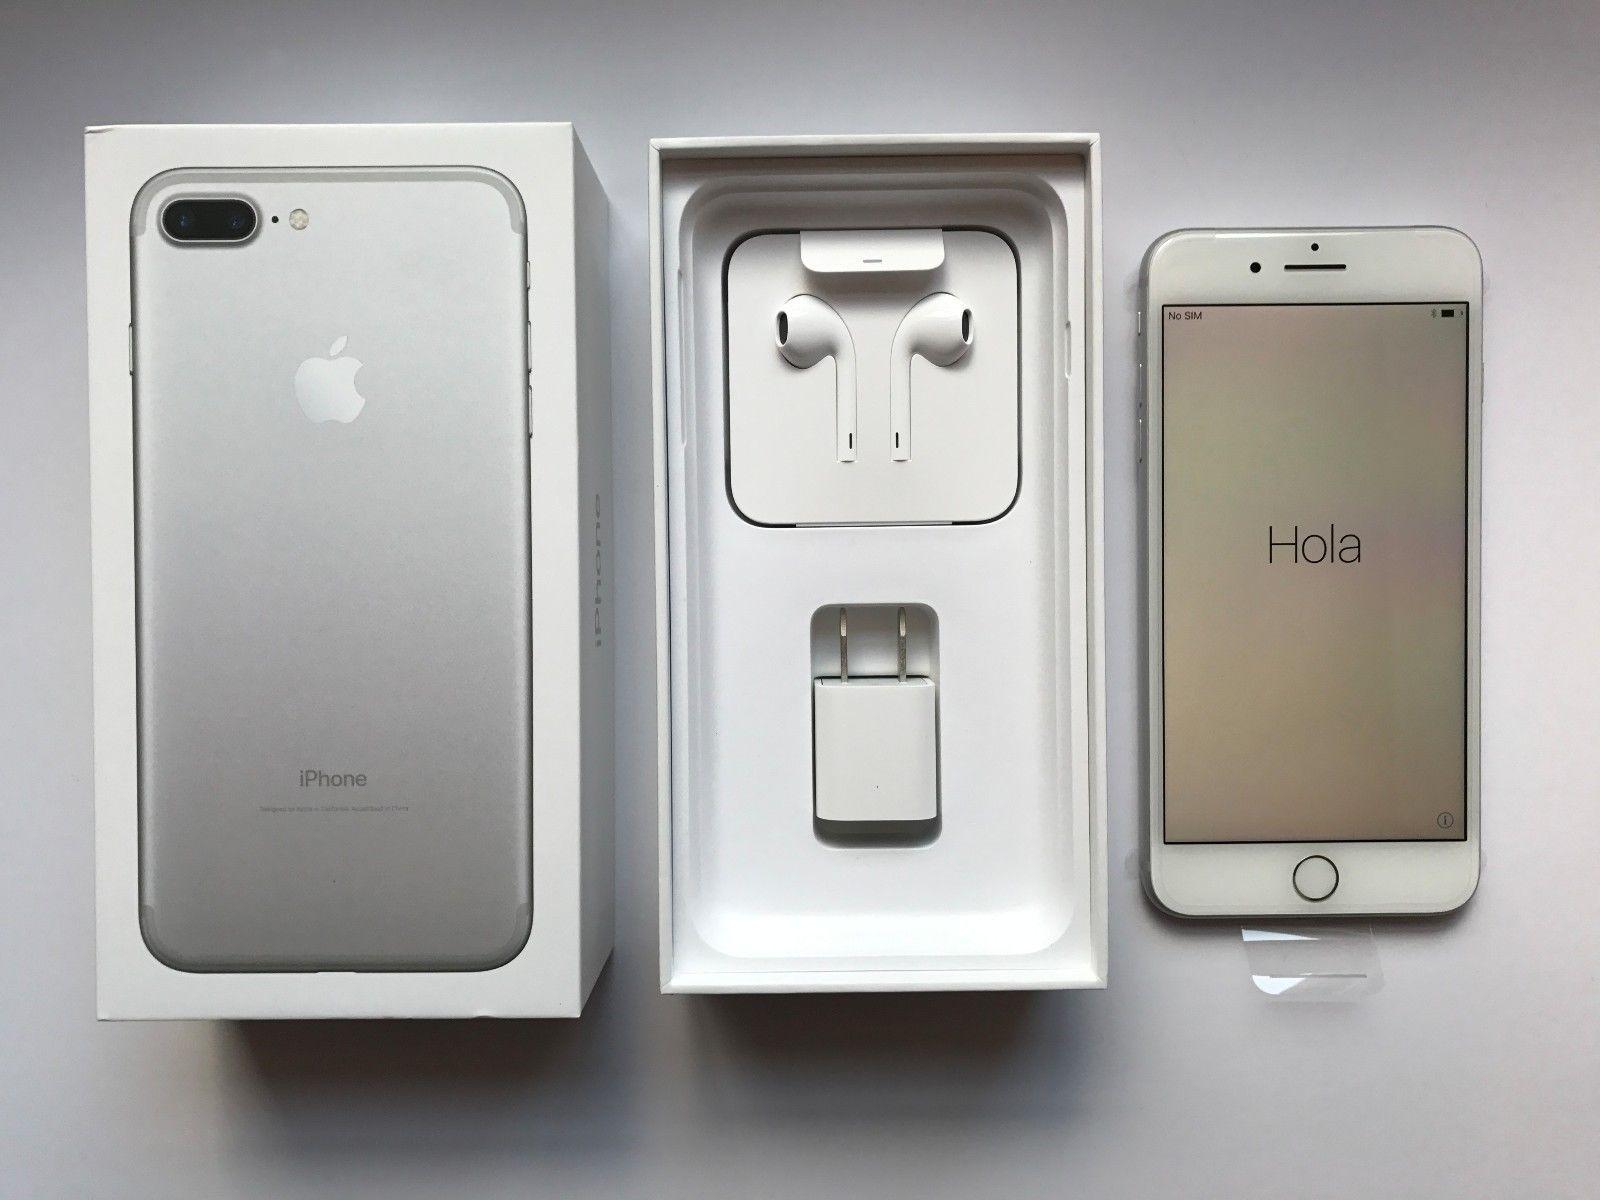 Apple Iphone 7 Plus 256 Gb Silver Unlocked Verizon Brand New Iphone 7 Plus Iphone Iphone 7